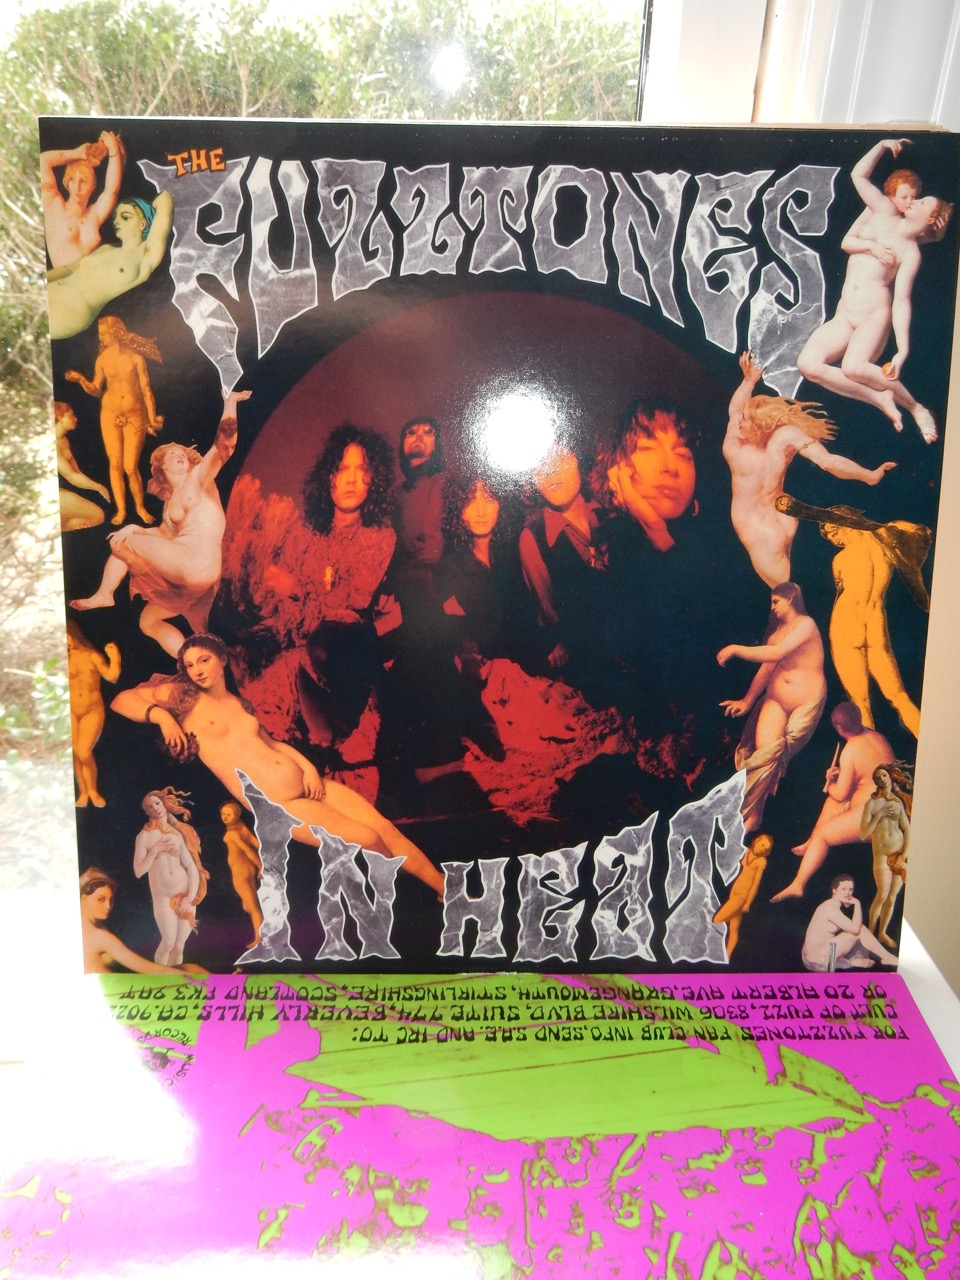 Fuzztones – In Heat - Vinyl 1989 with Extras